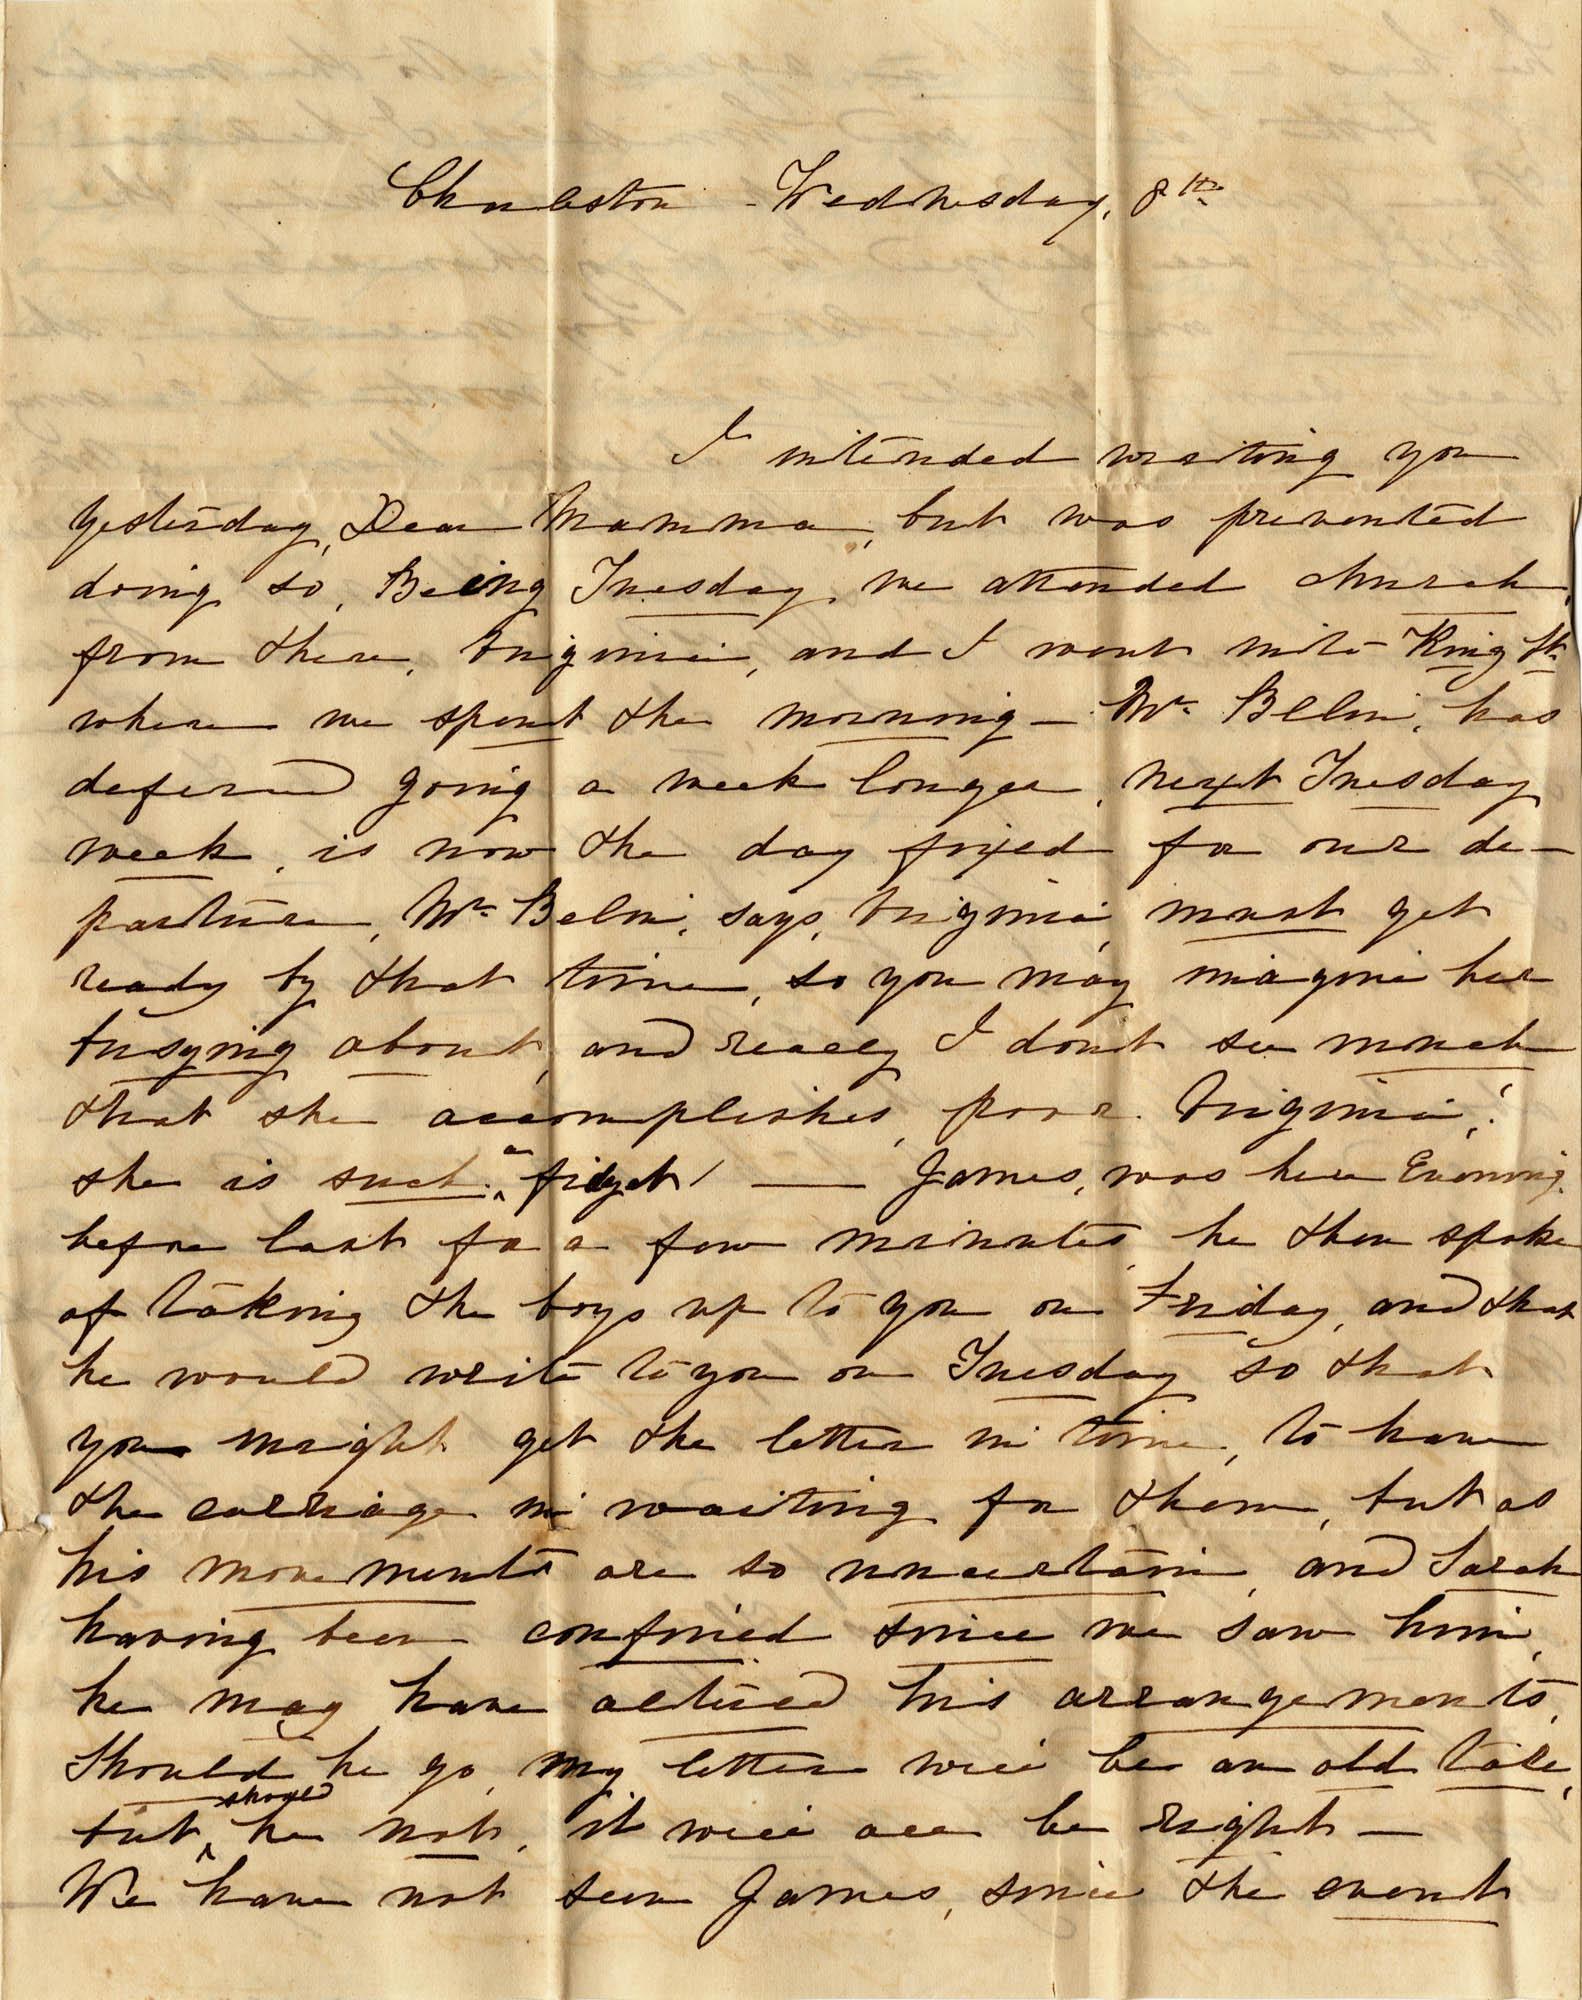 040. Sarah to Eleanora Wilkinson -- 8th, n.d.